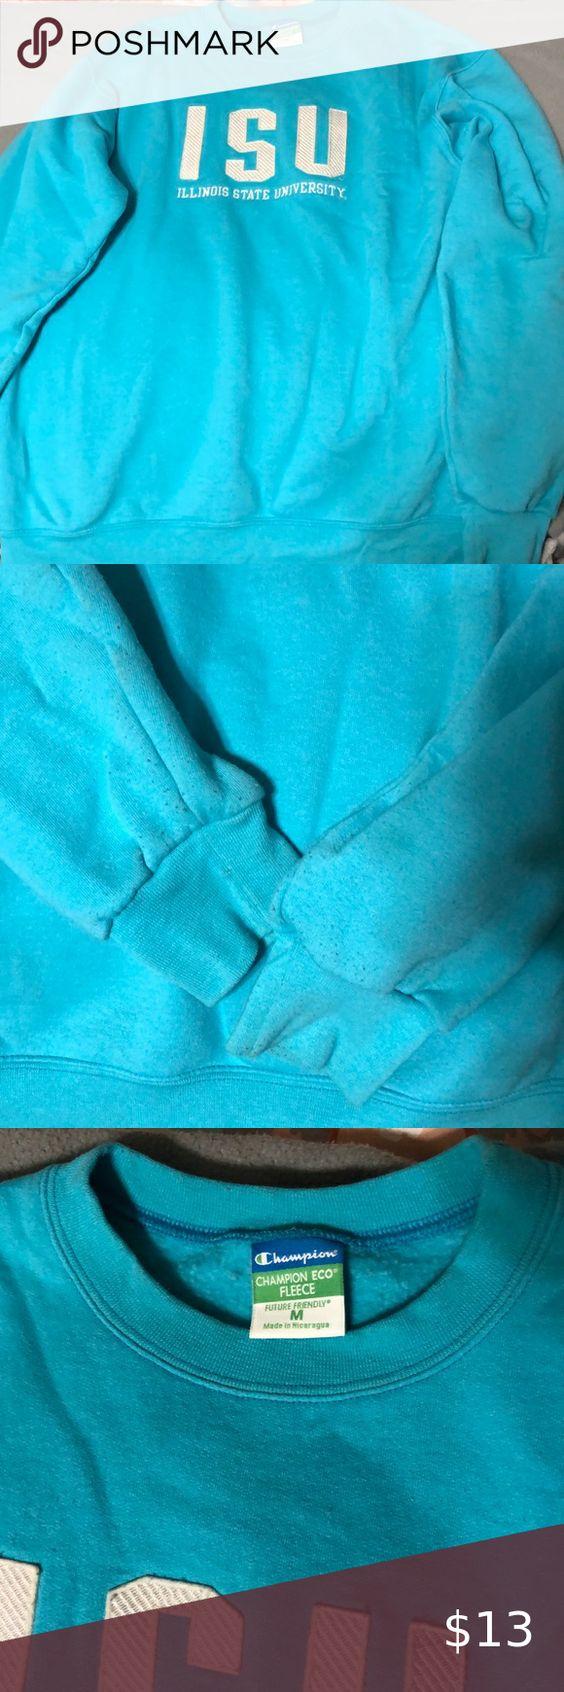 Bright Blue Isu Crewneck Sweatshirt Tops Sweatshirts Hoodie Champion Tops [ 1692 x 564 Pixel ]